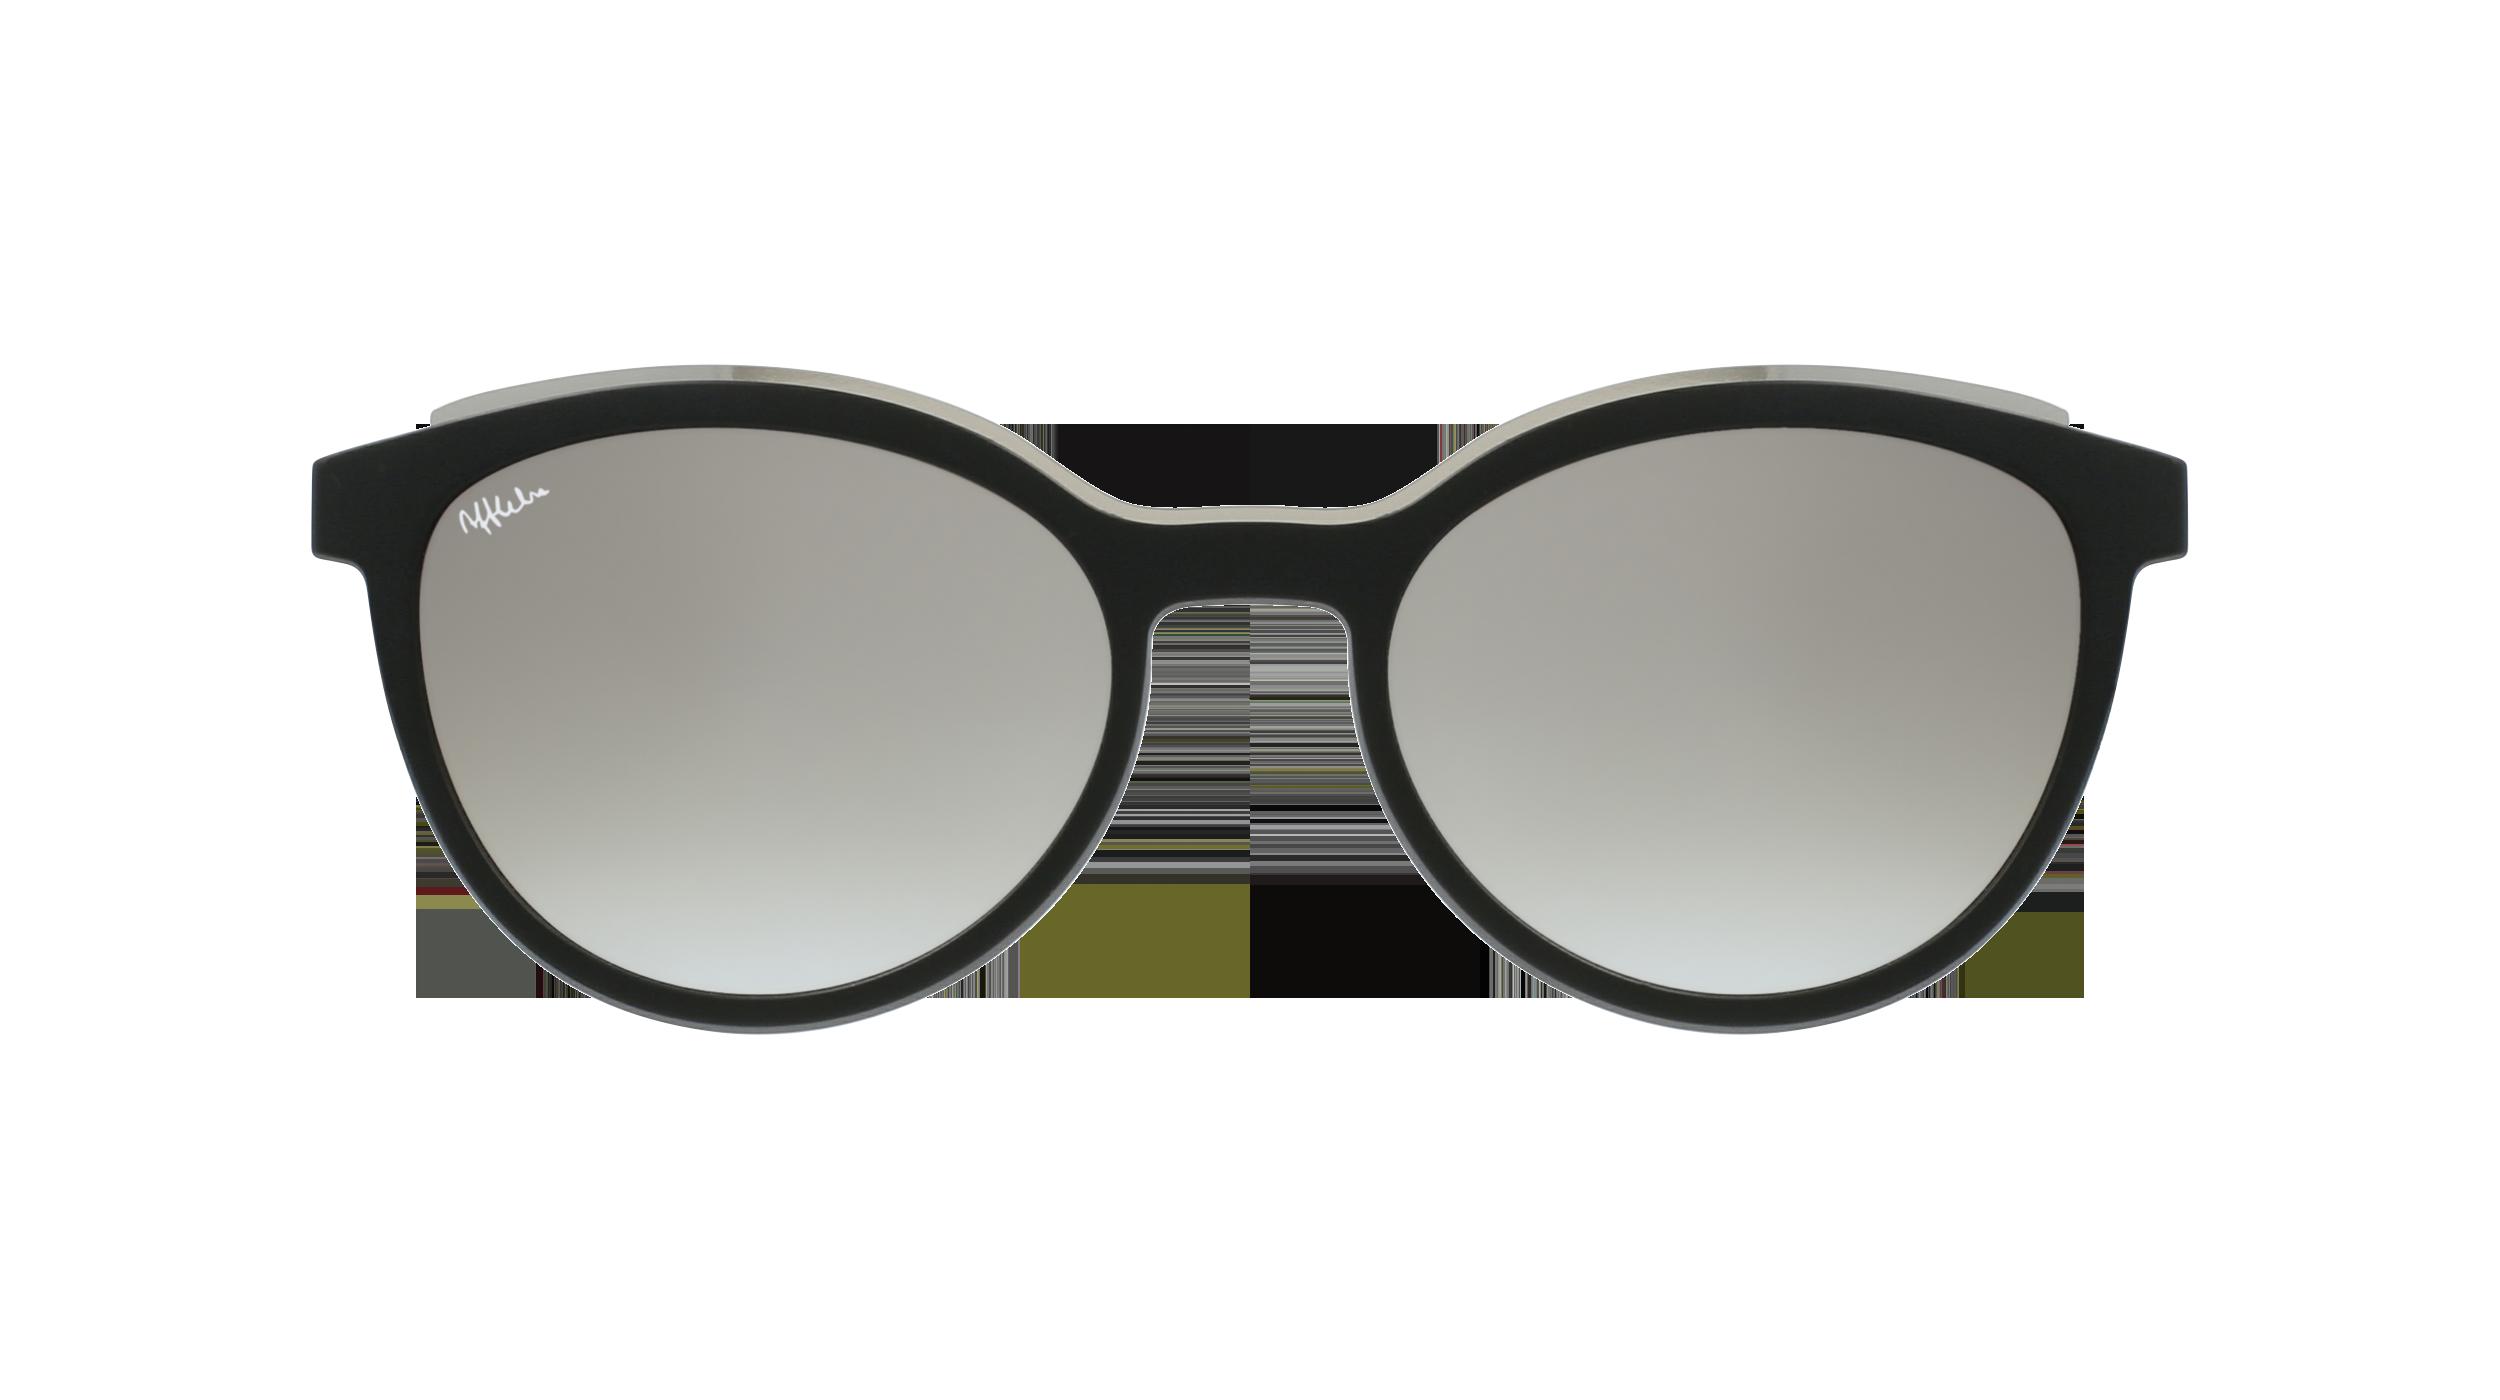 afflelou/france/products/smart_clip/clips_glasses/07630036458990.png